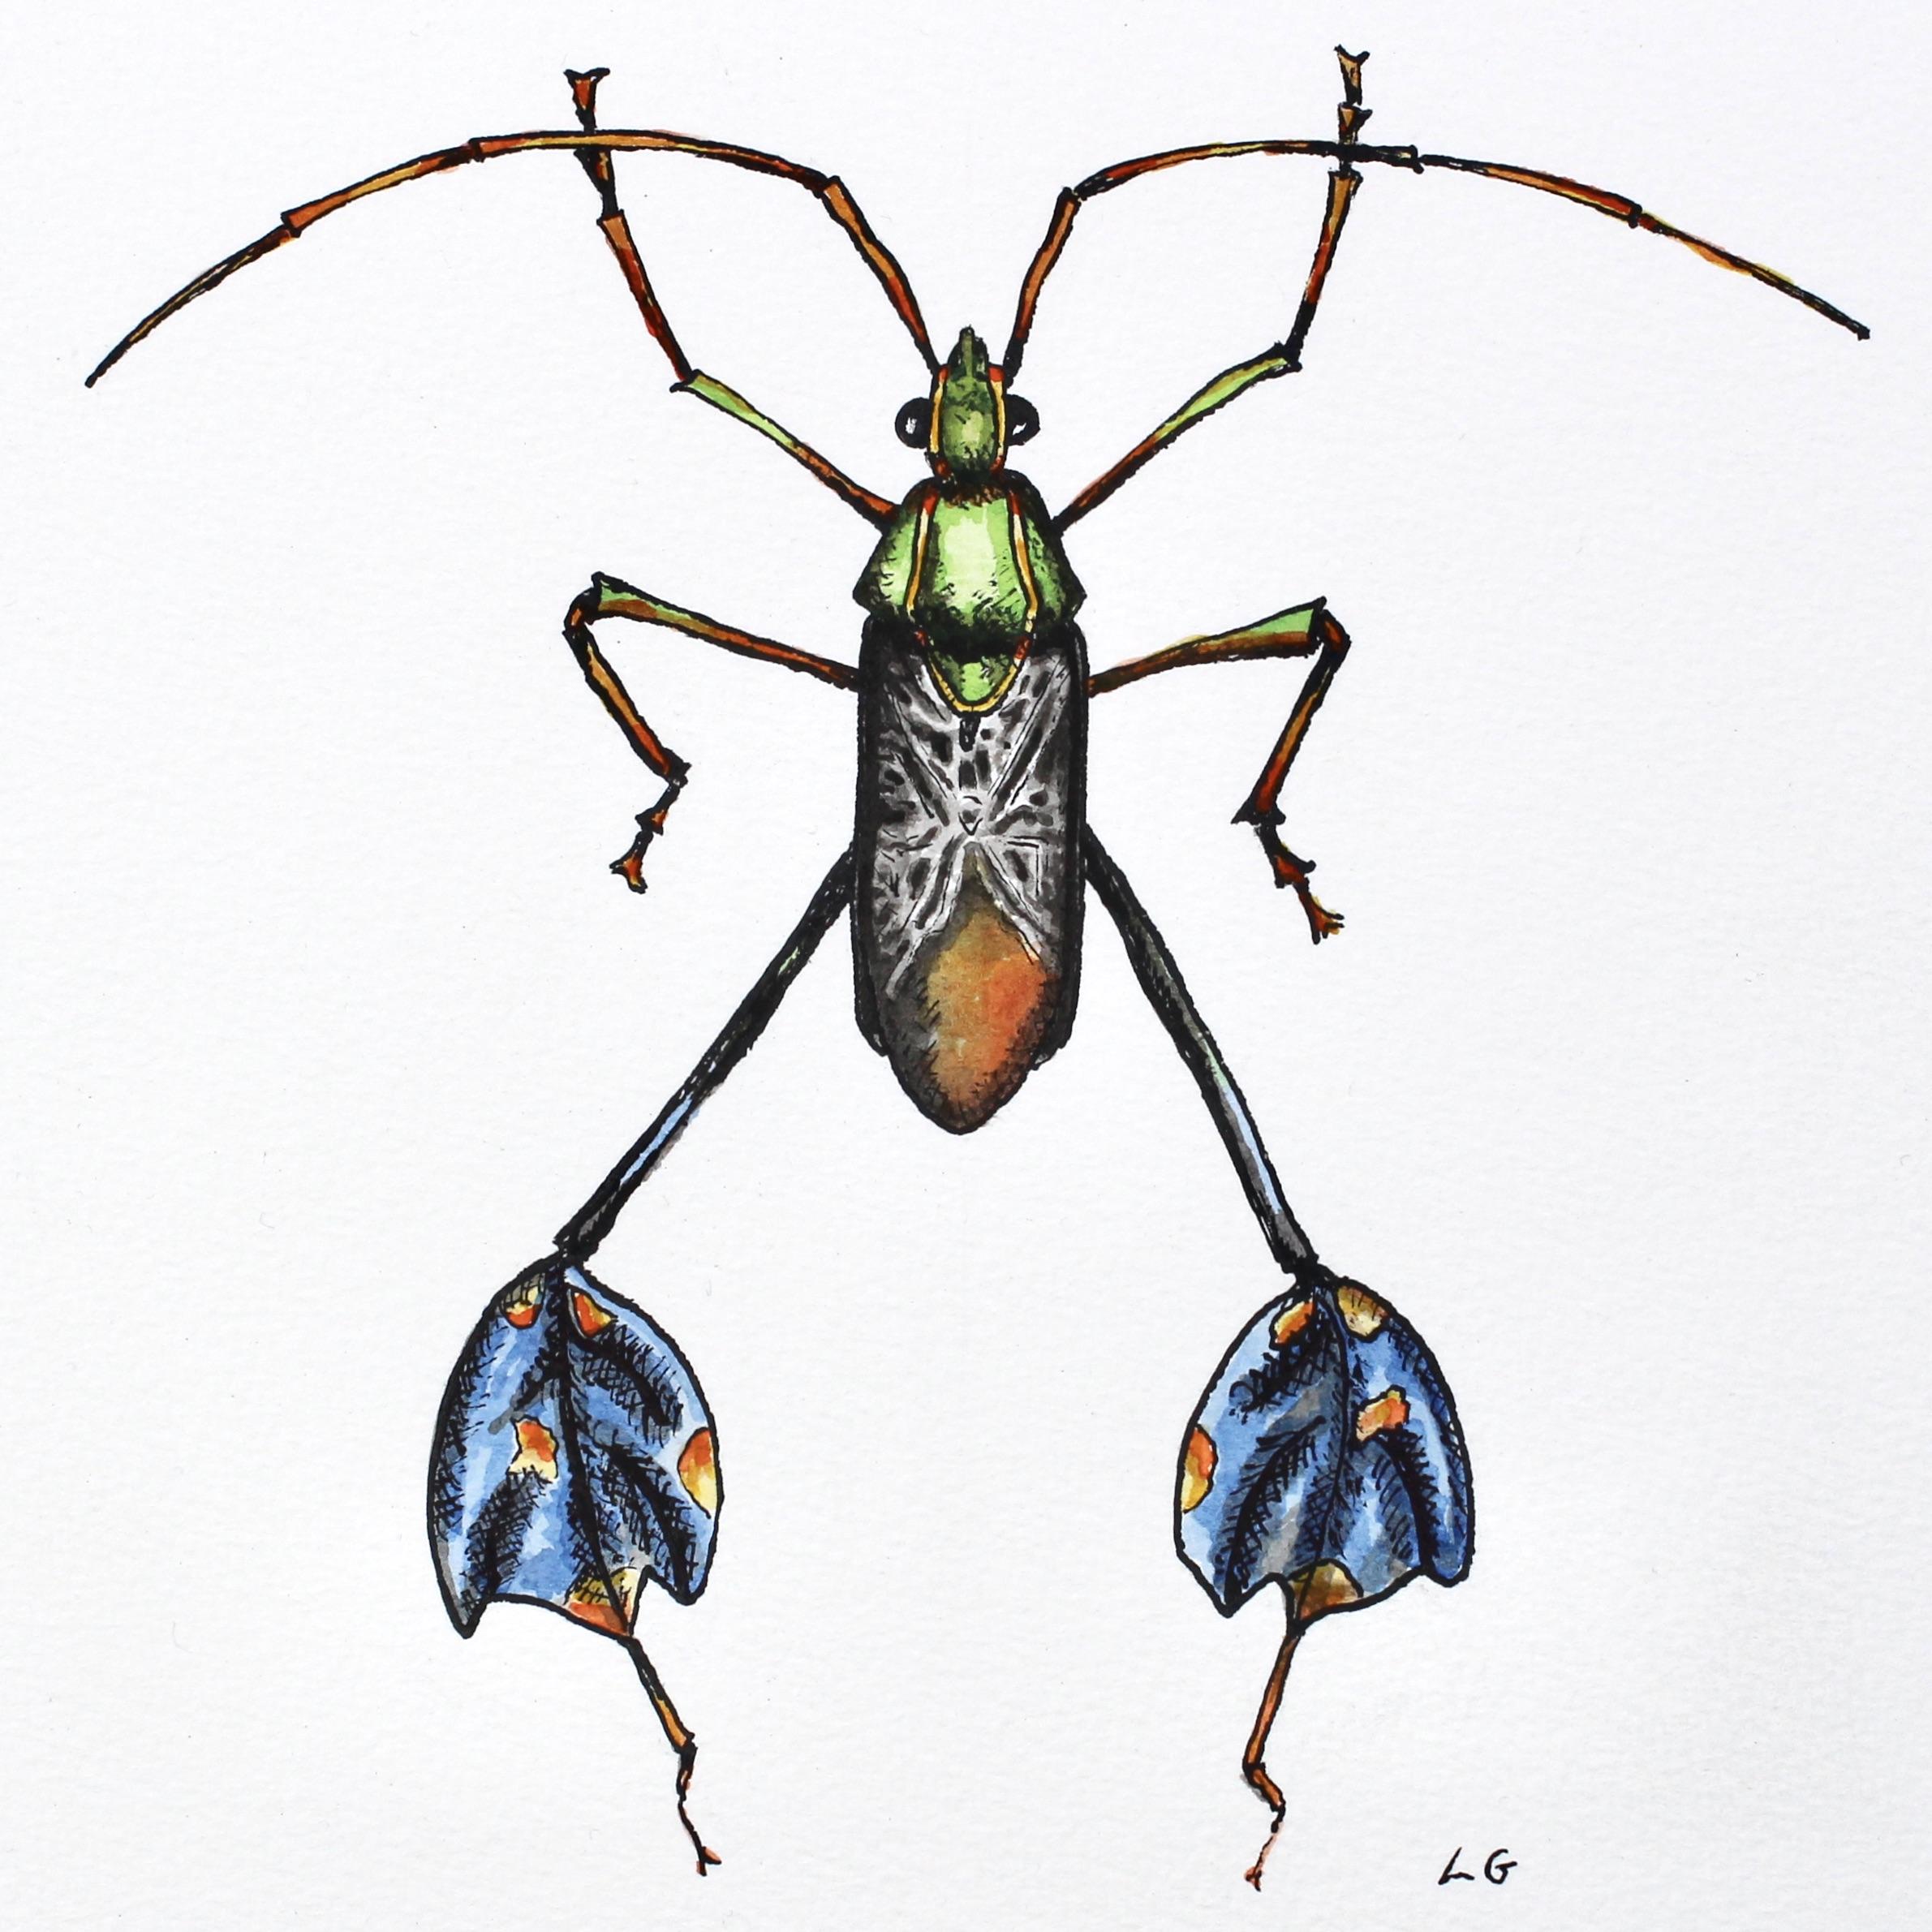 Blue leaf-footed bug